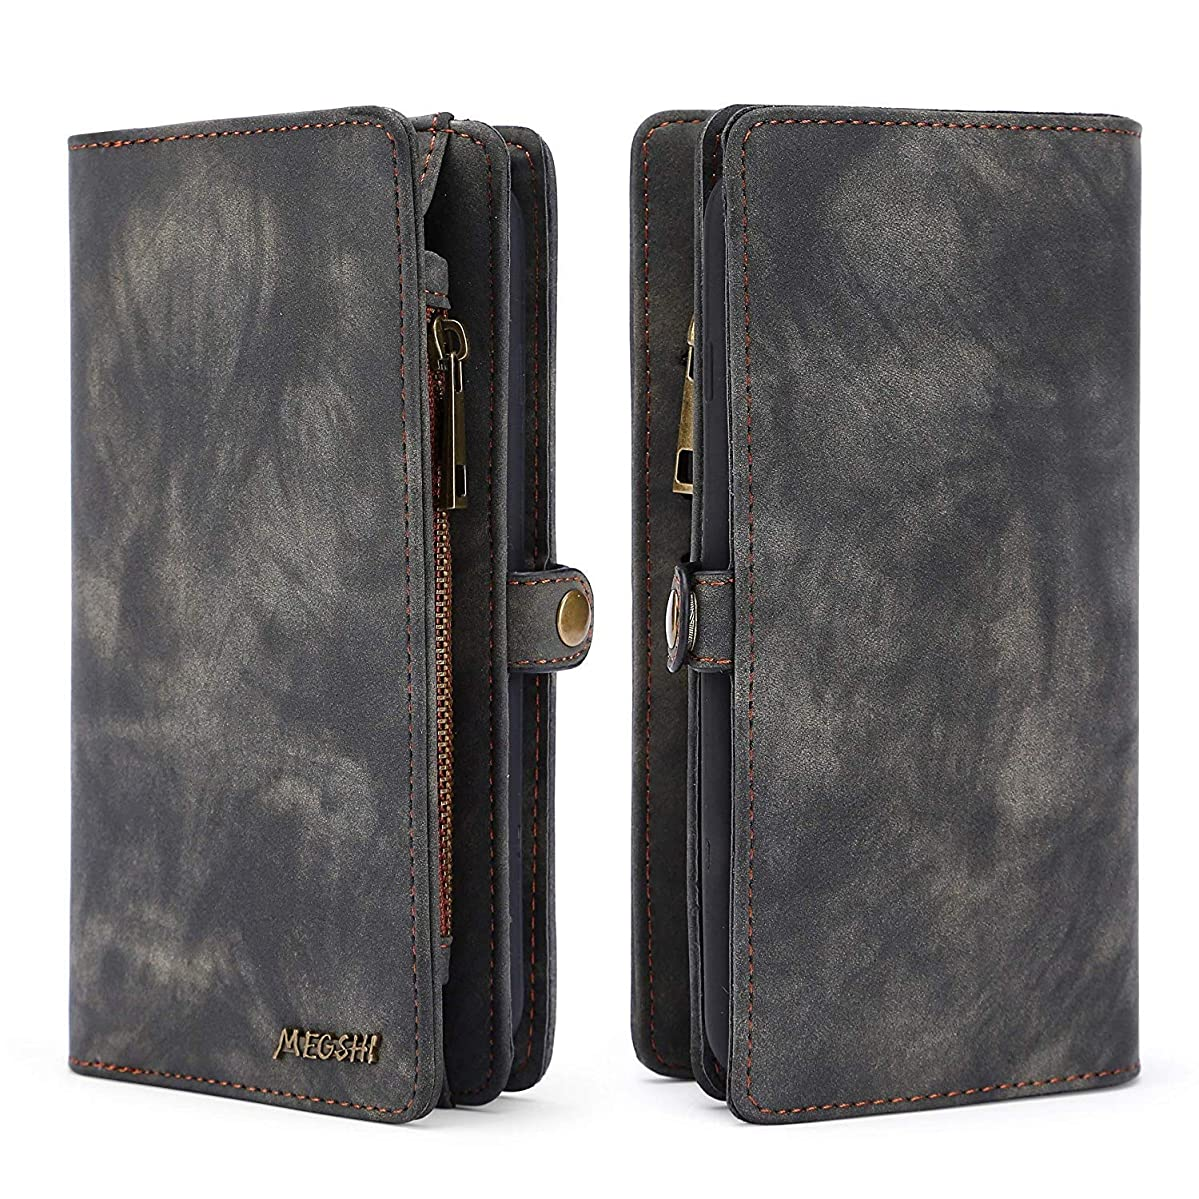 Spritech LG Stylo 4 Wallet Case,LG Q Stylus Case,LG Stylo 4 Plus,Handmade Leather Large Capacity Detachable Zipper Wallet Cover